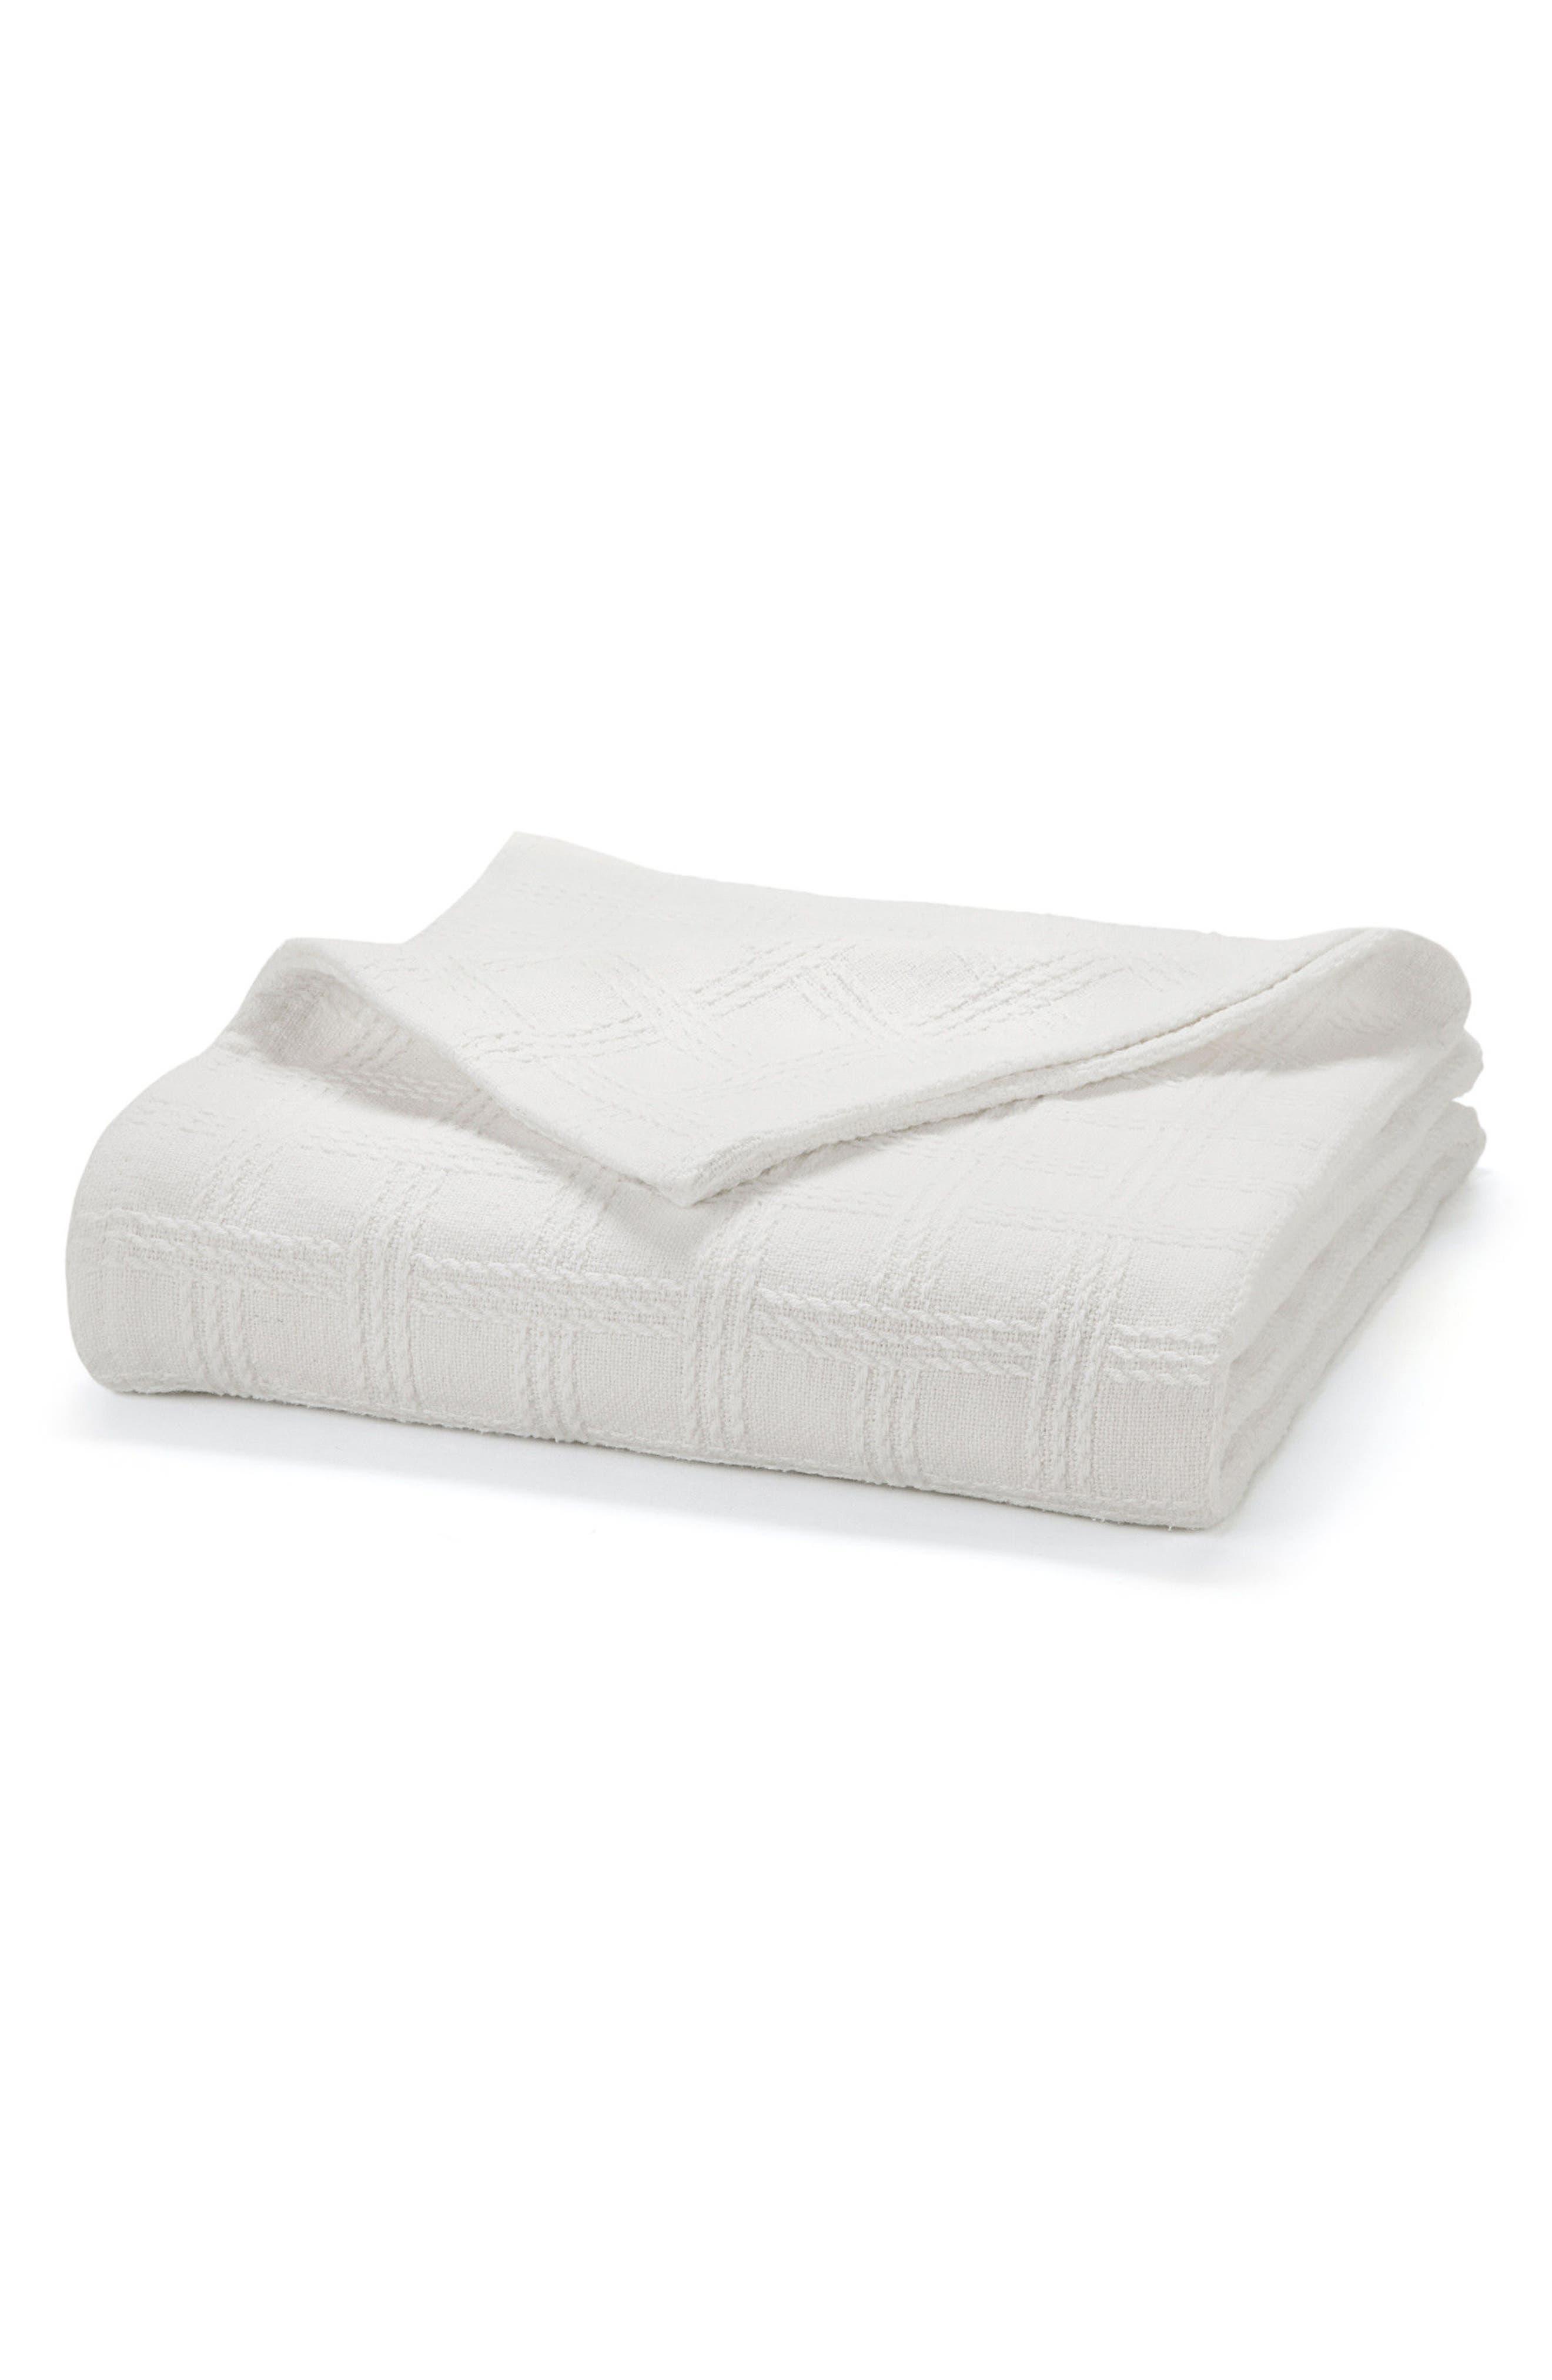 Classic Cotton Twin Size Blanket,                             Main thumbnail 1, color,                             100